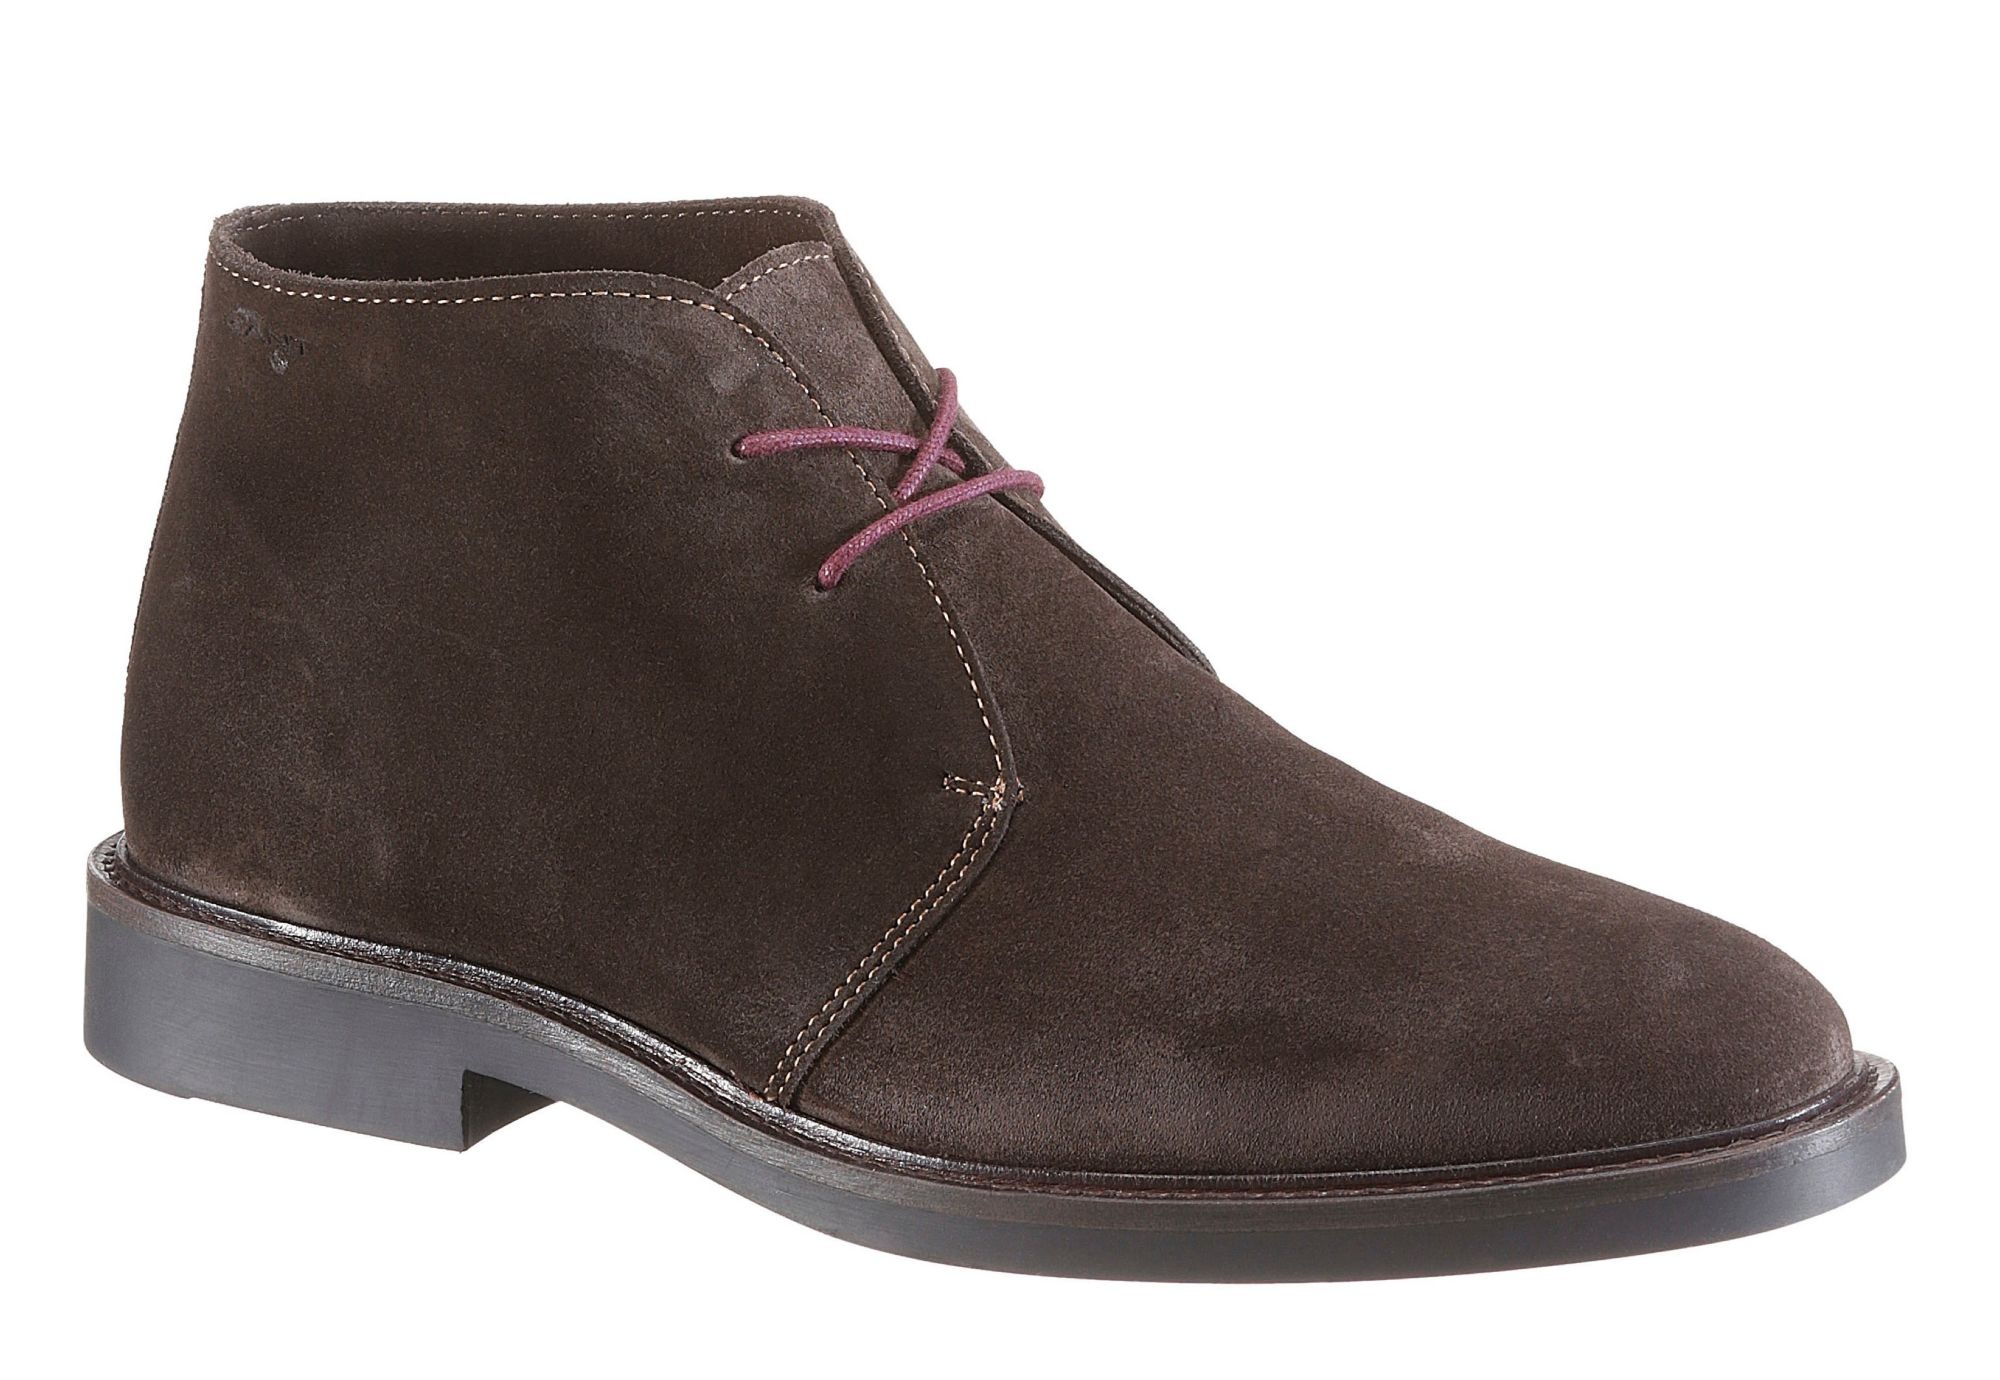 GANT FOOTWEAR Gant Footwear Schnürboots »Spencer«